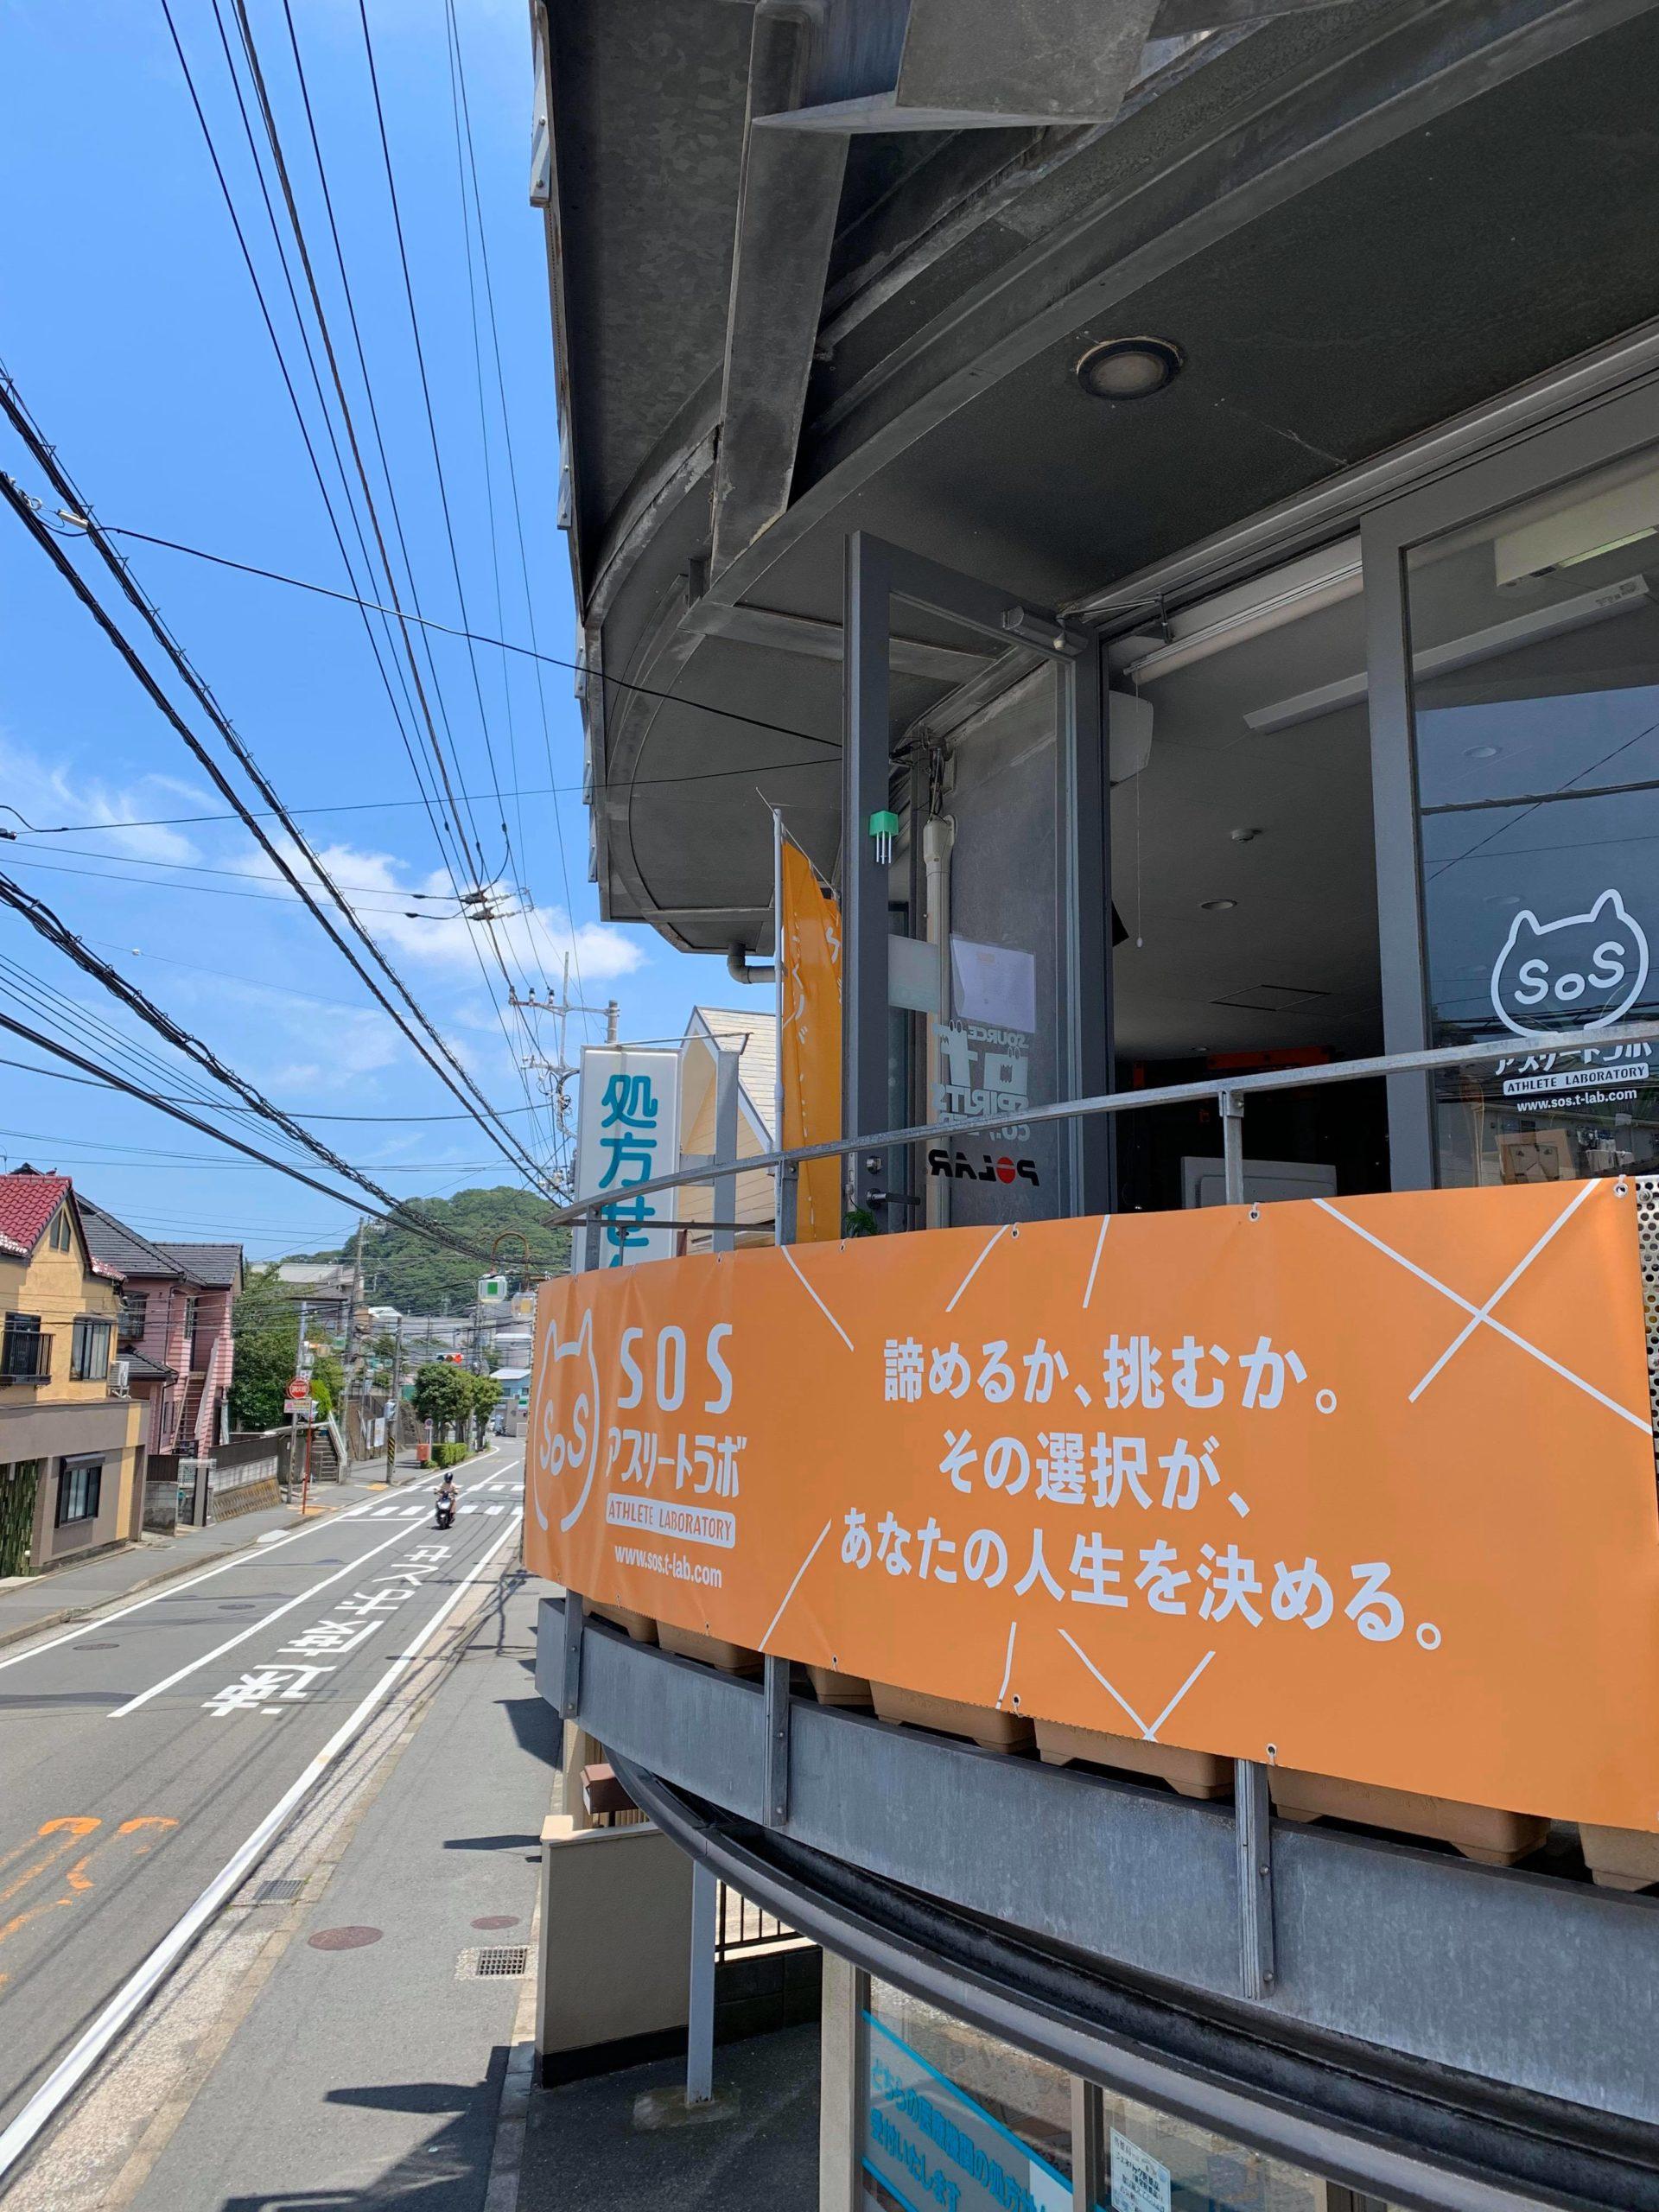 SOSアスリートラボ横須賀